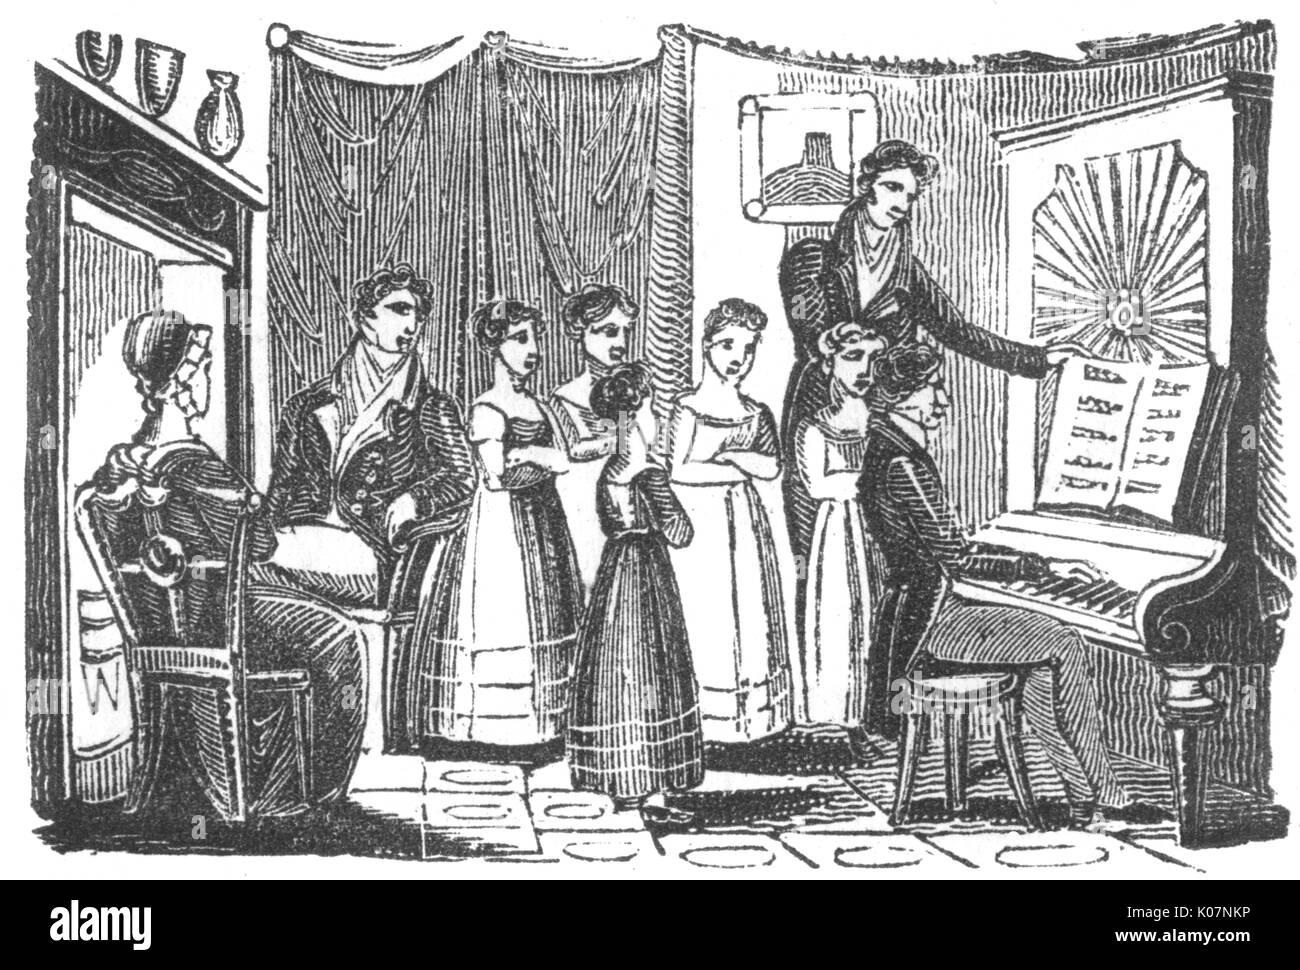 A piano recital for a family, interior, c. 1800     Date: C.1800 - Stock Image